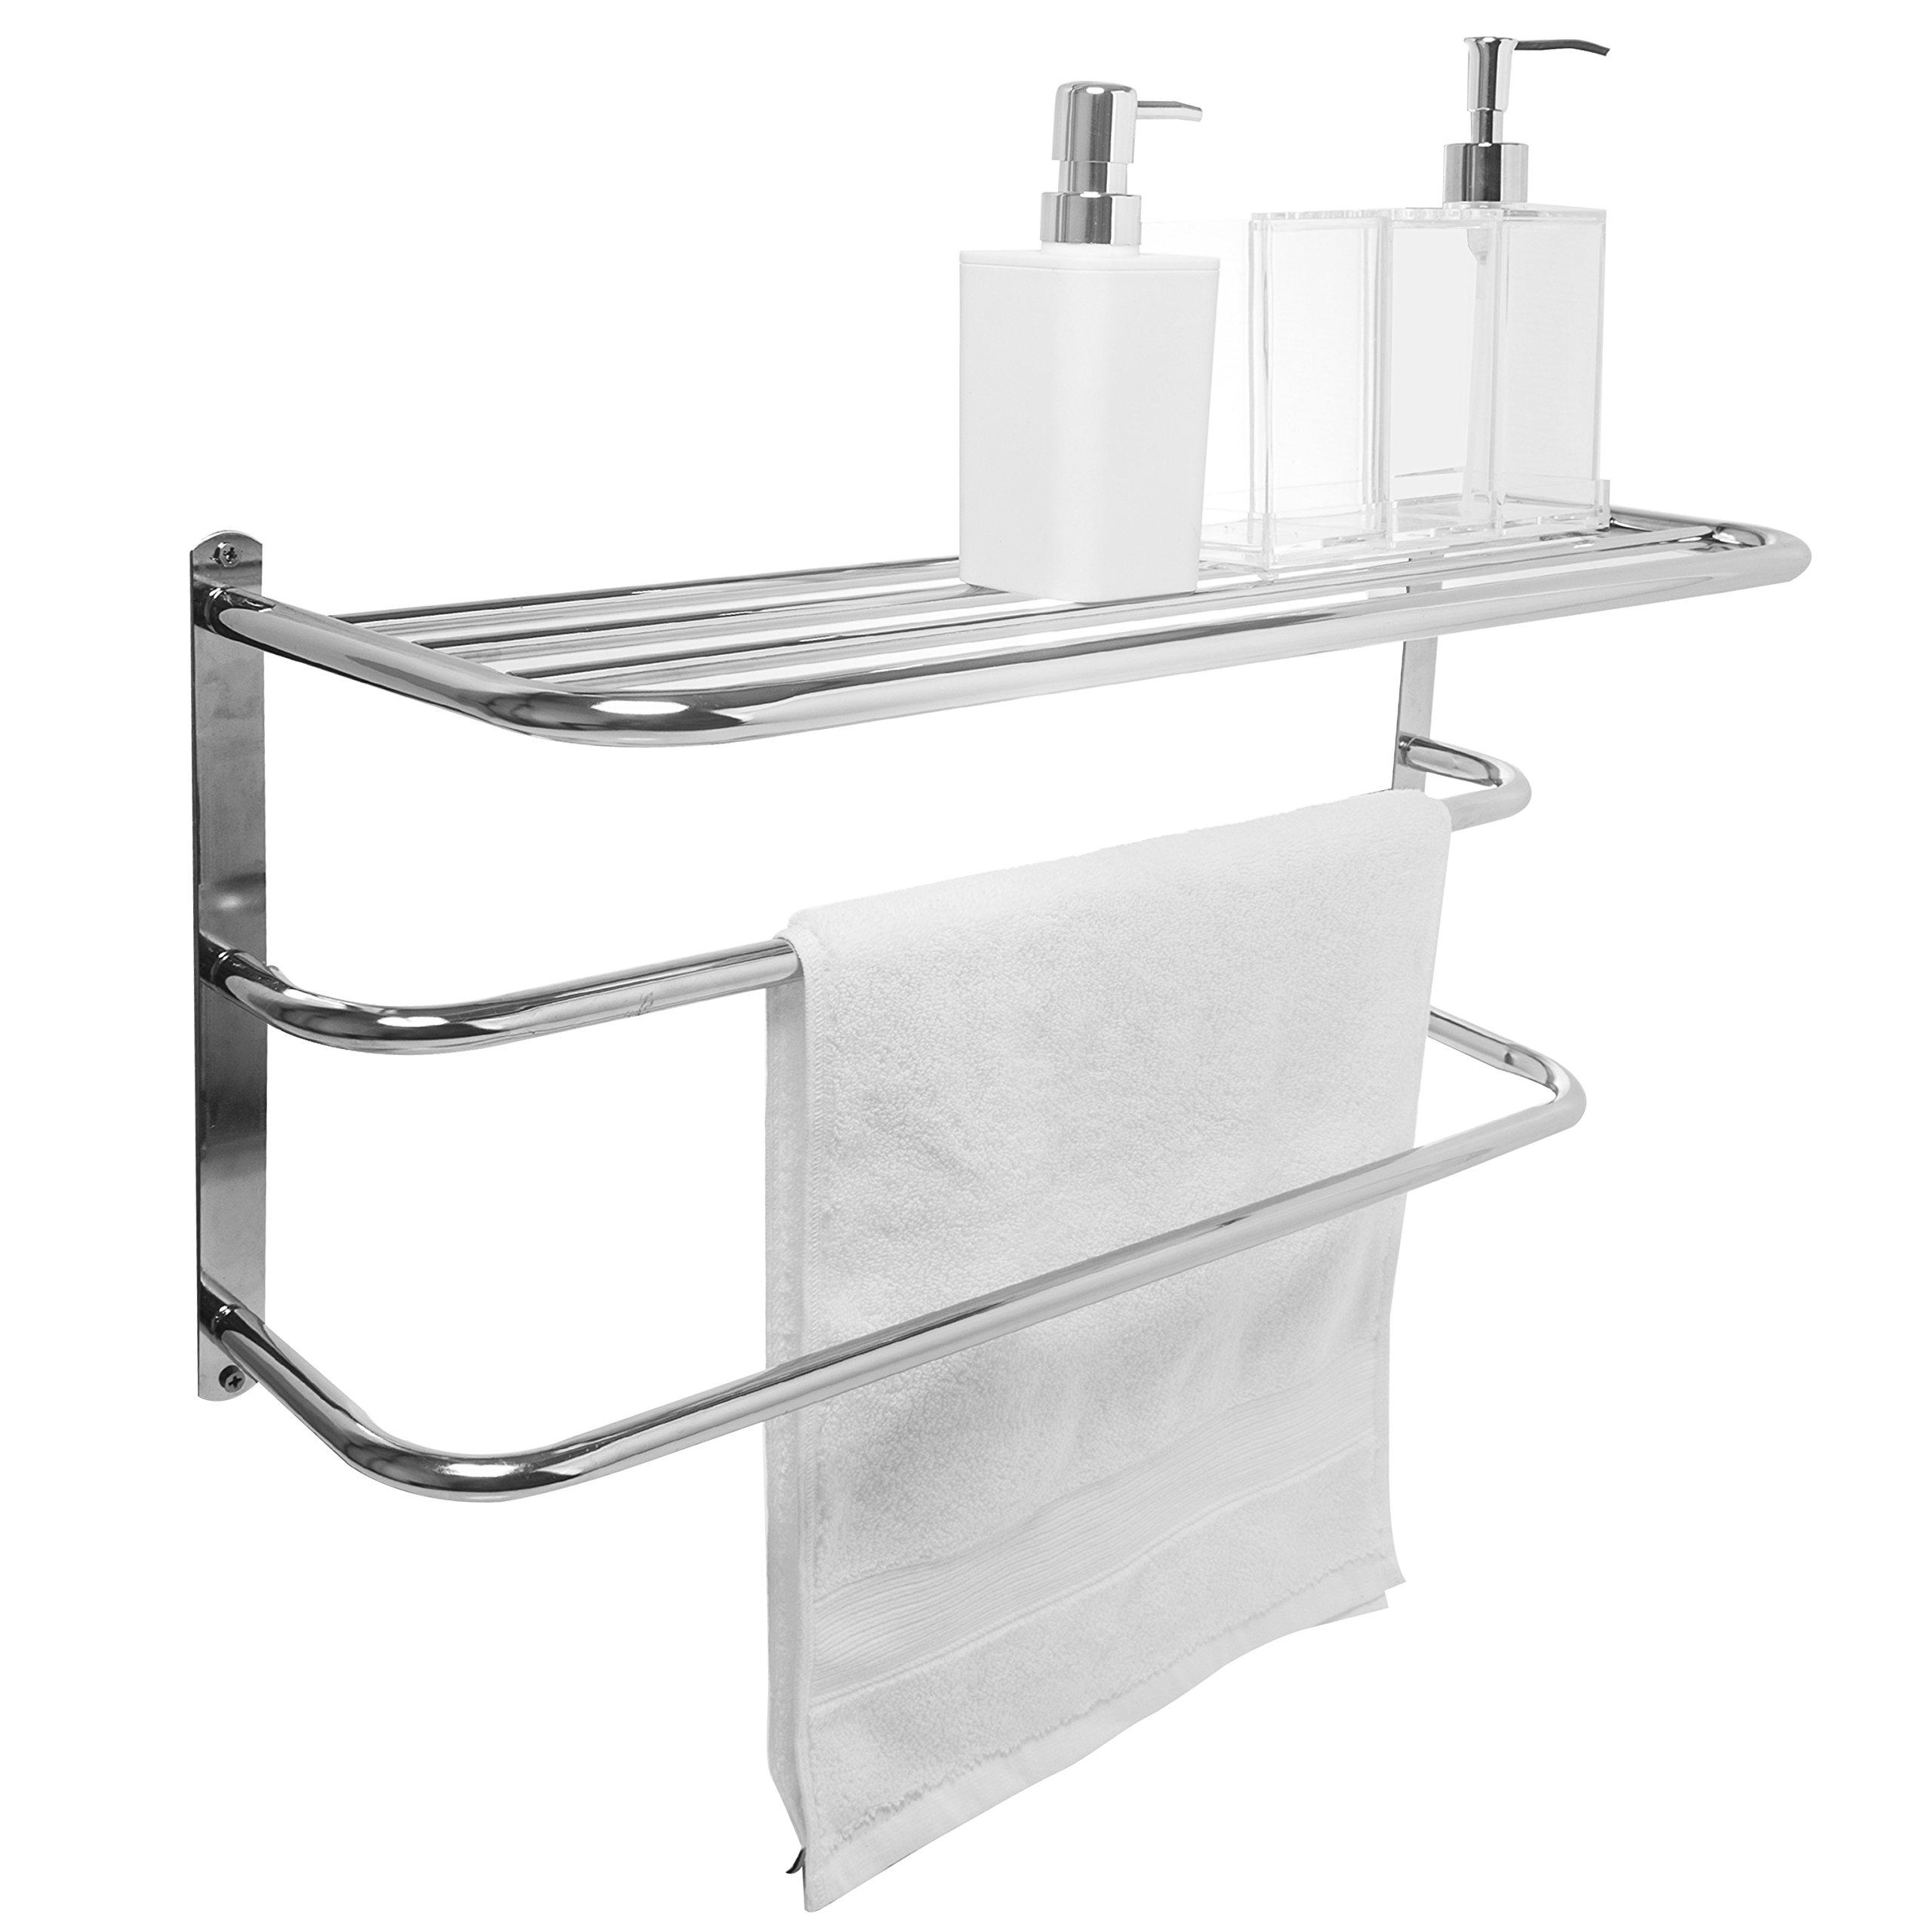 Details about Wall Mounted 2 Bar Towel Rack Storage Shelf 3 Tier Chrome Bathroom Organizer